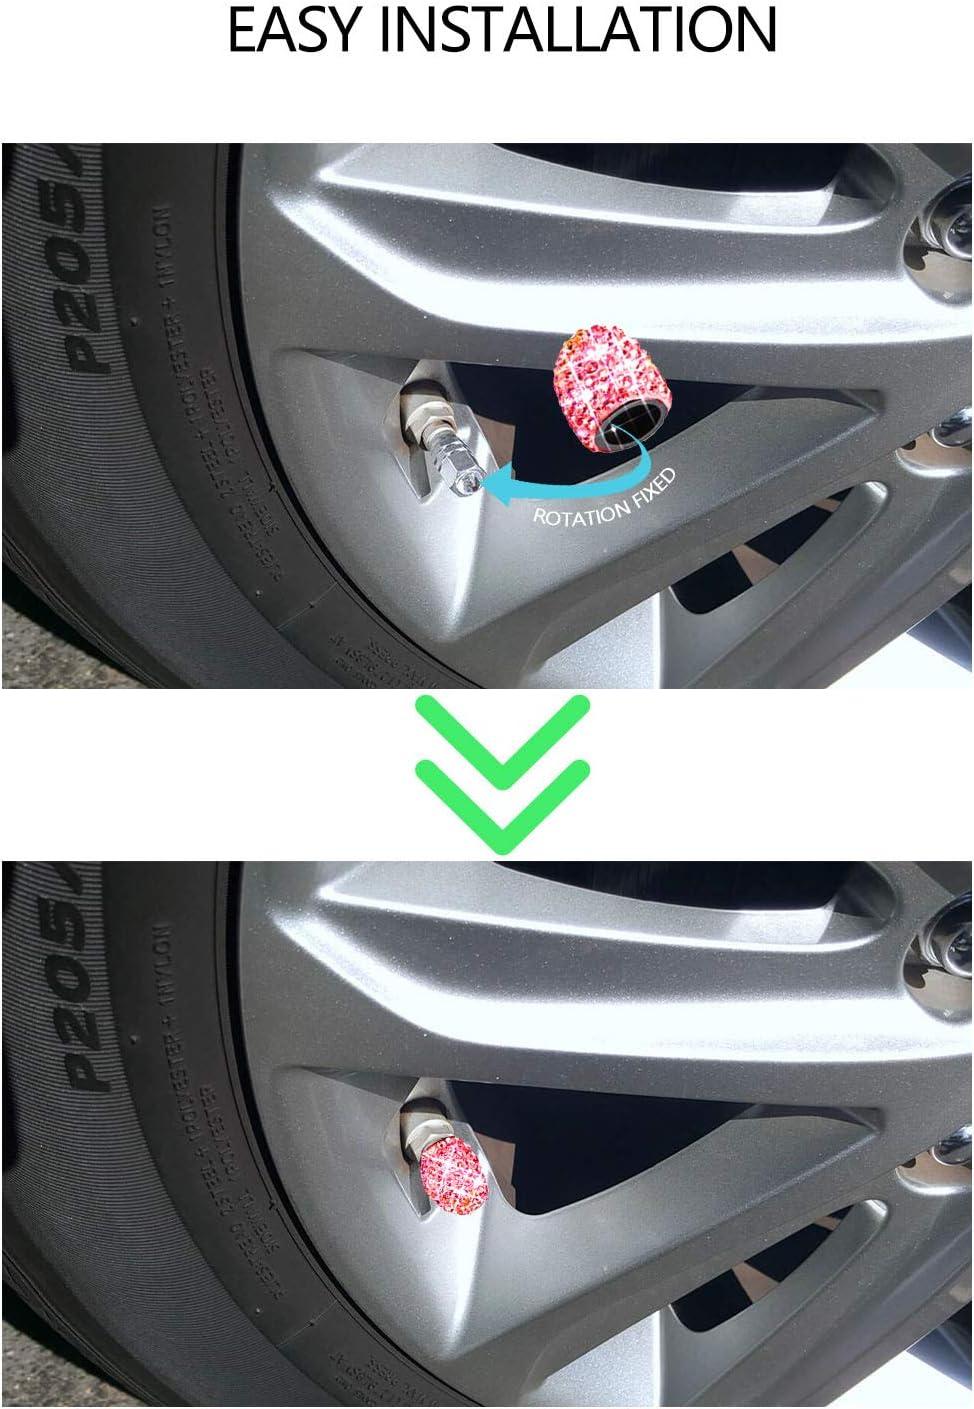 White Sparkling Handmade Crystal Rhinestone Universal Car Tire Valve Caps Chrome,Attractive Dustproof Bling Car Accessories Sikawai Tire Valve Stem Caps